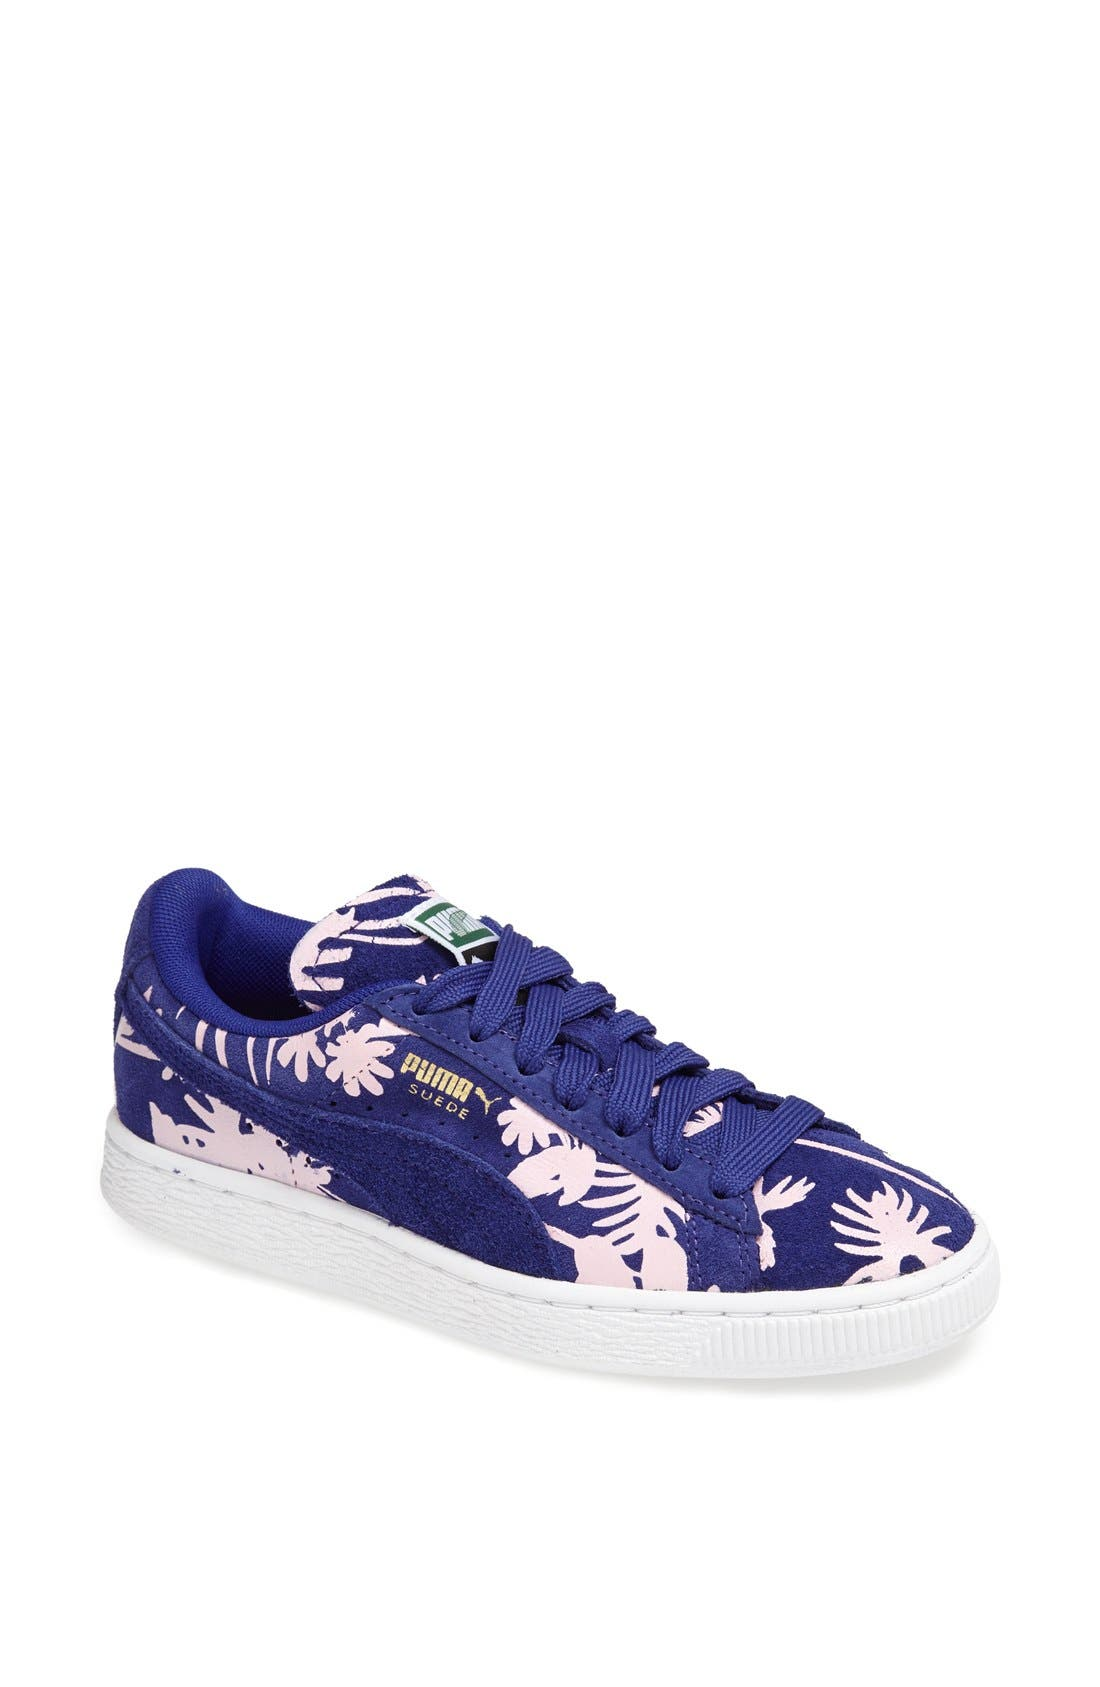 Alternate Image 1 Selected - PUMA 'Suede Classic Tropicalia' Sneaker (Women)